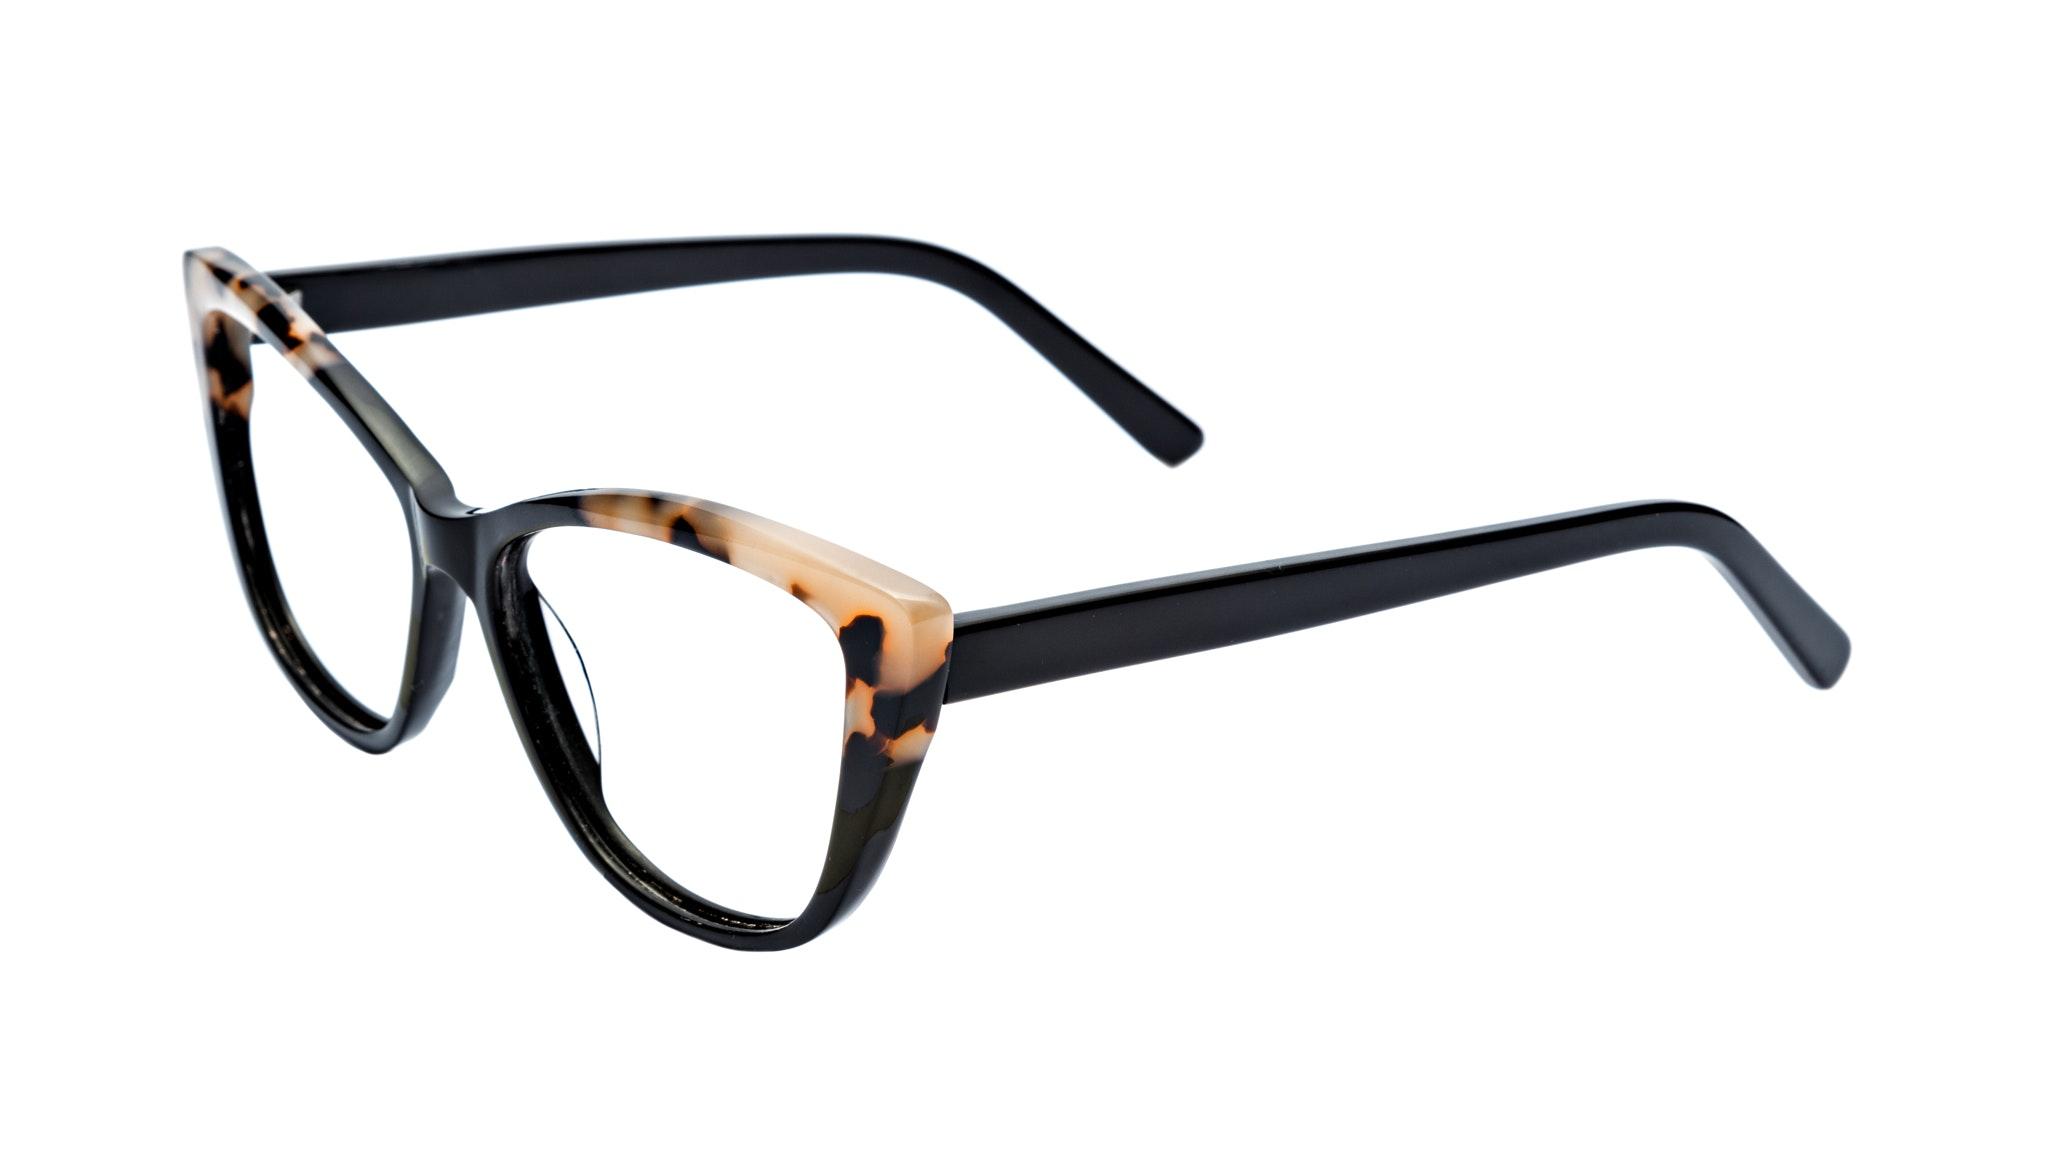 Affordable Fashion Glasses Cat Eye Daring Cateye Eyeglasses Women Dolled Up Ebony Granite Tilt